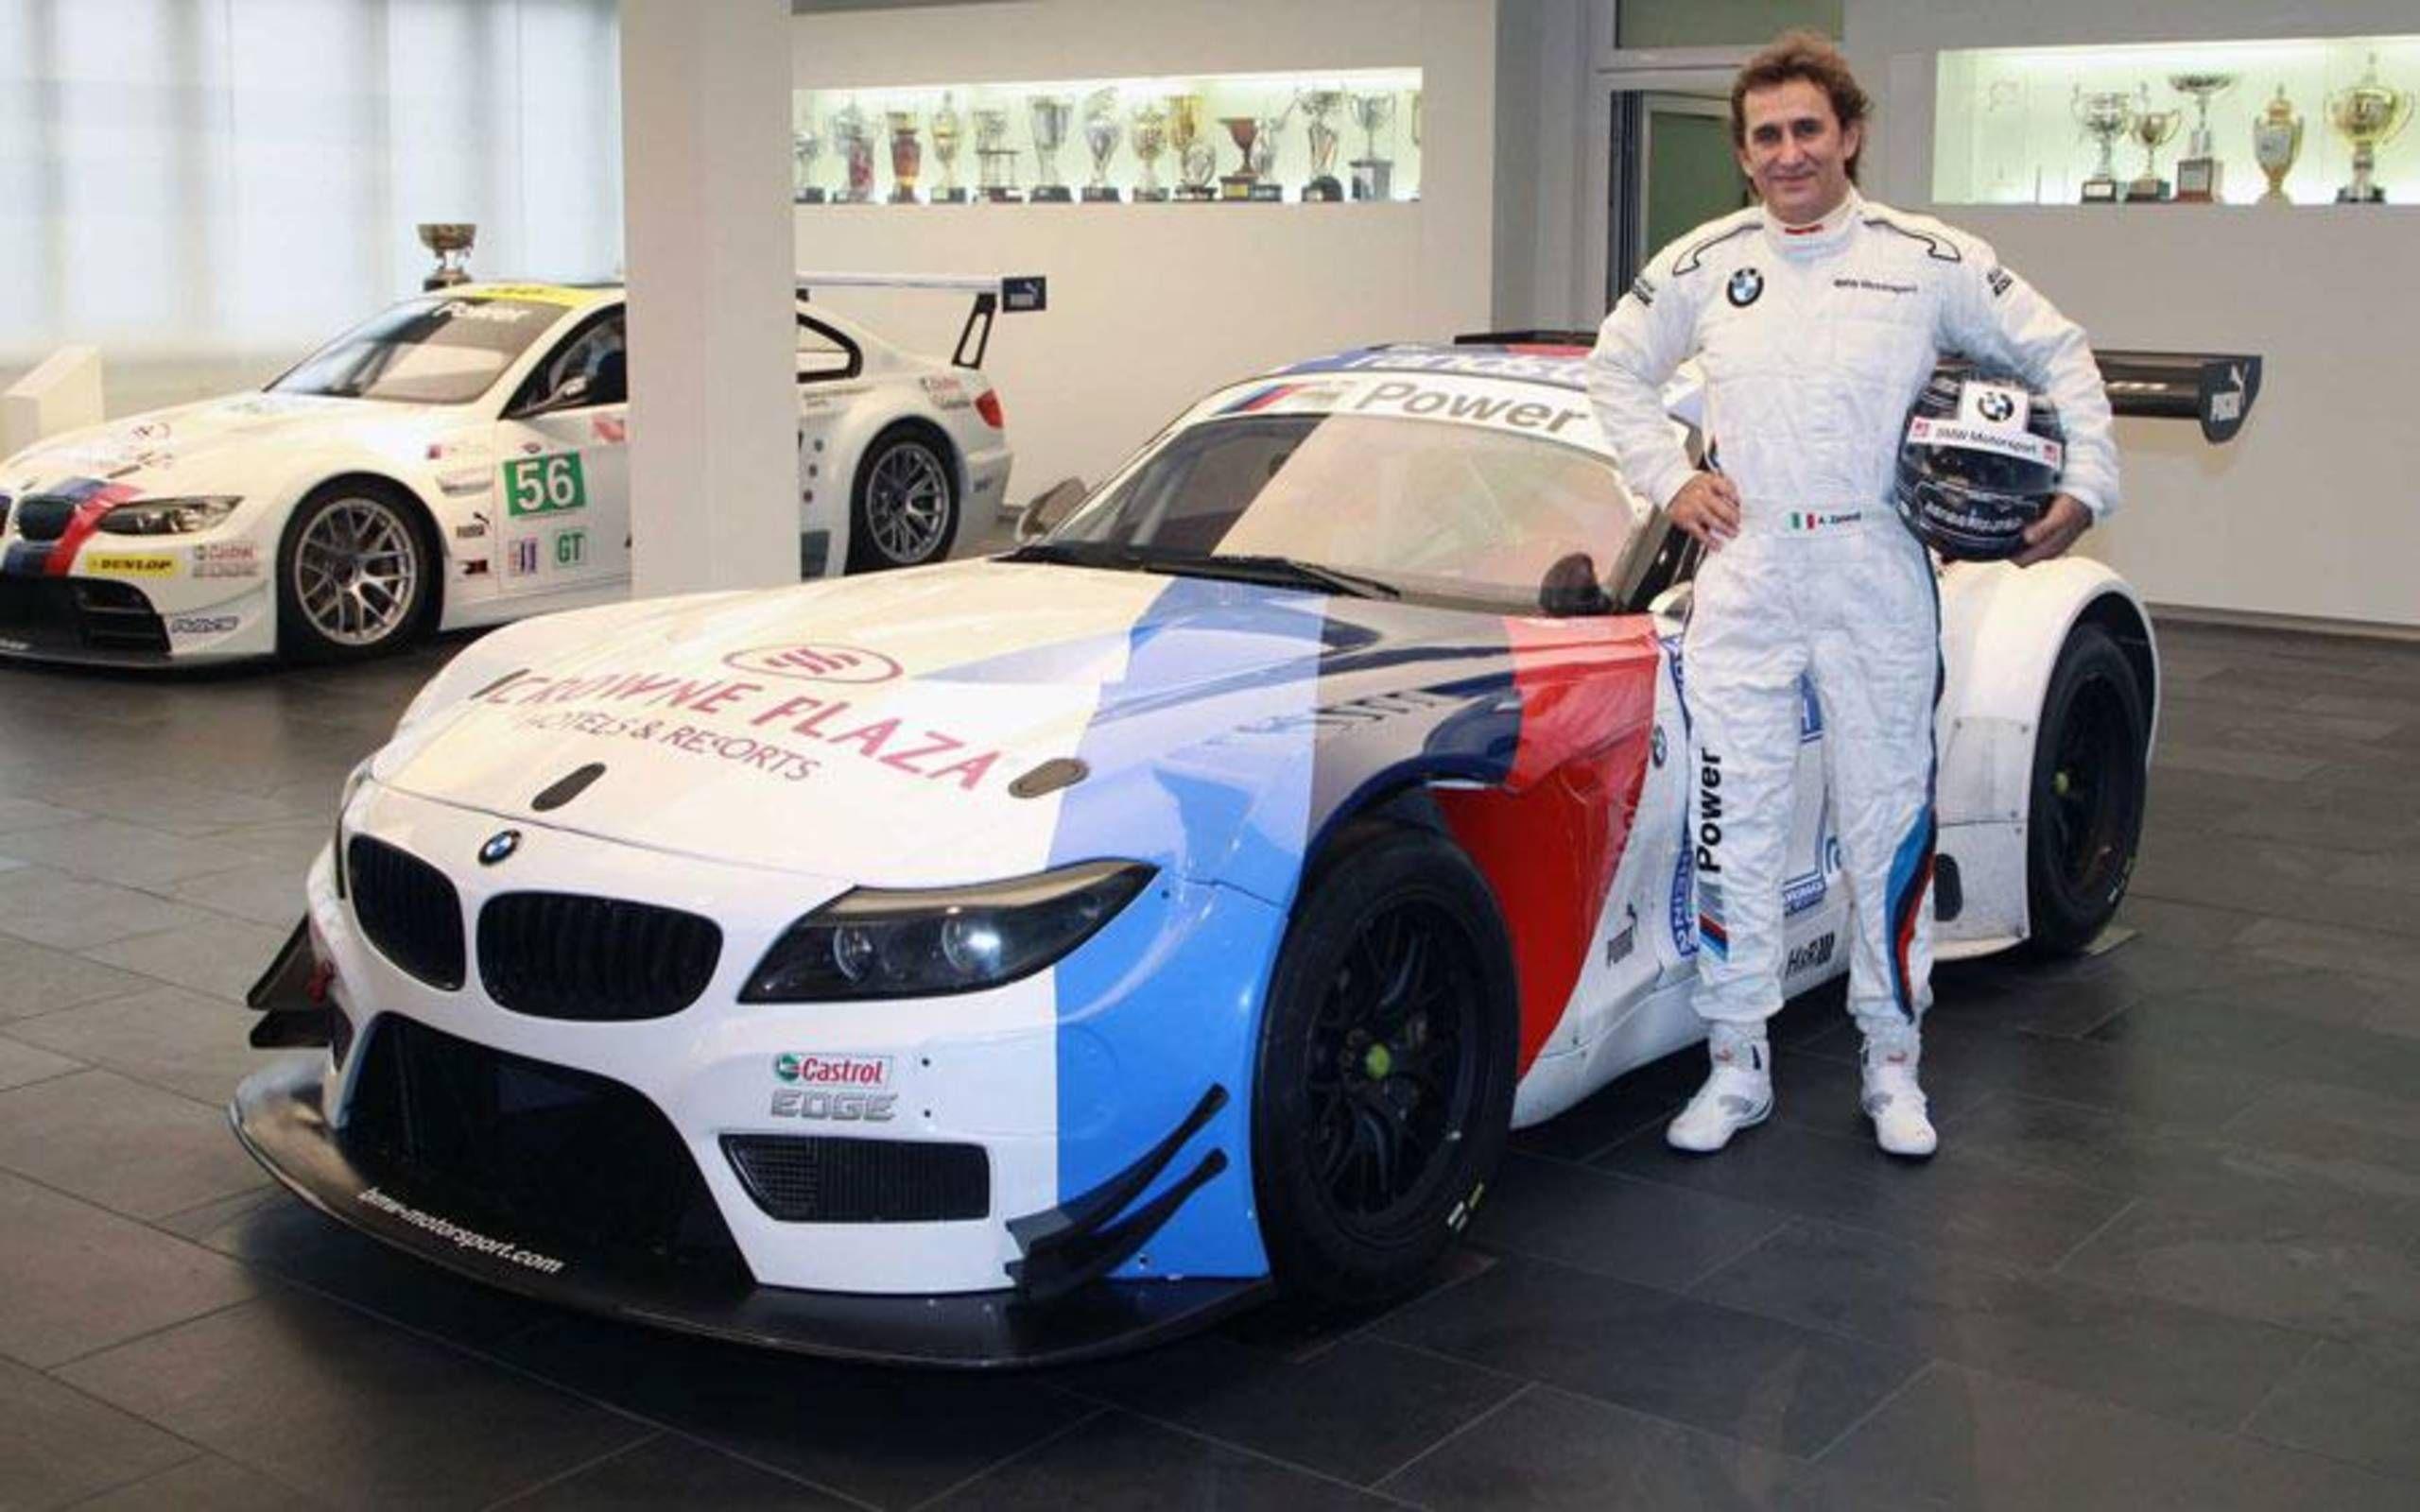 Alex Zanardi to get full-time ride in the 2014 Blancpain Sprint Series